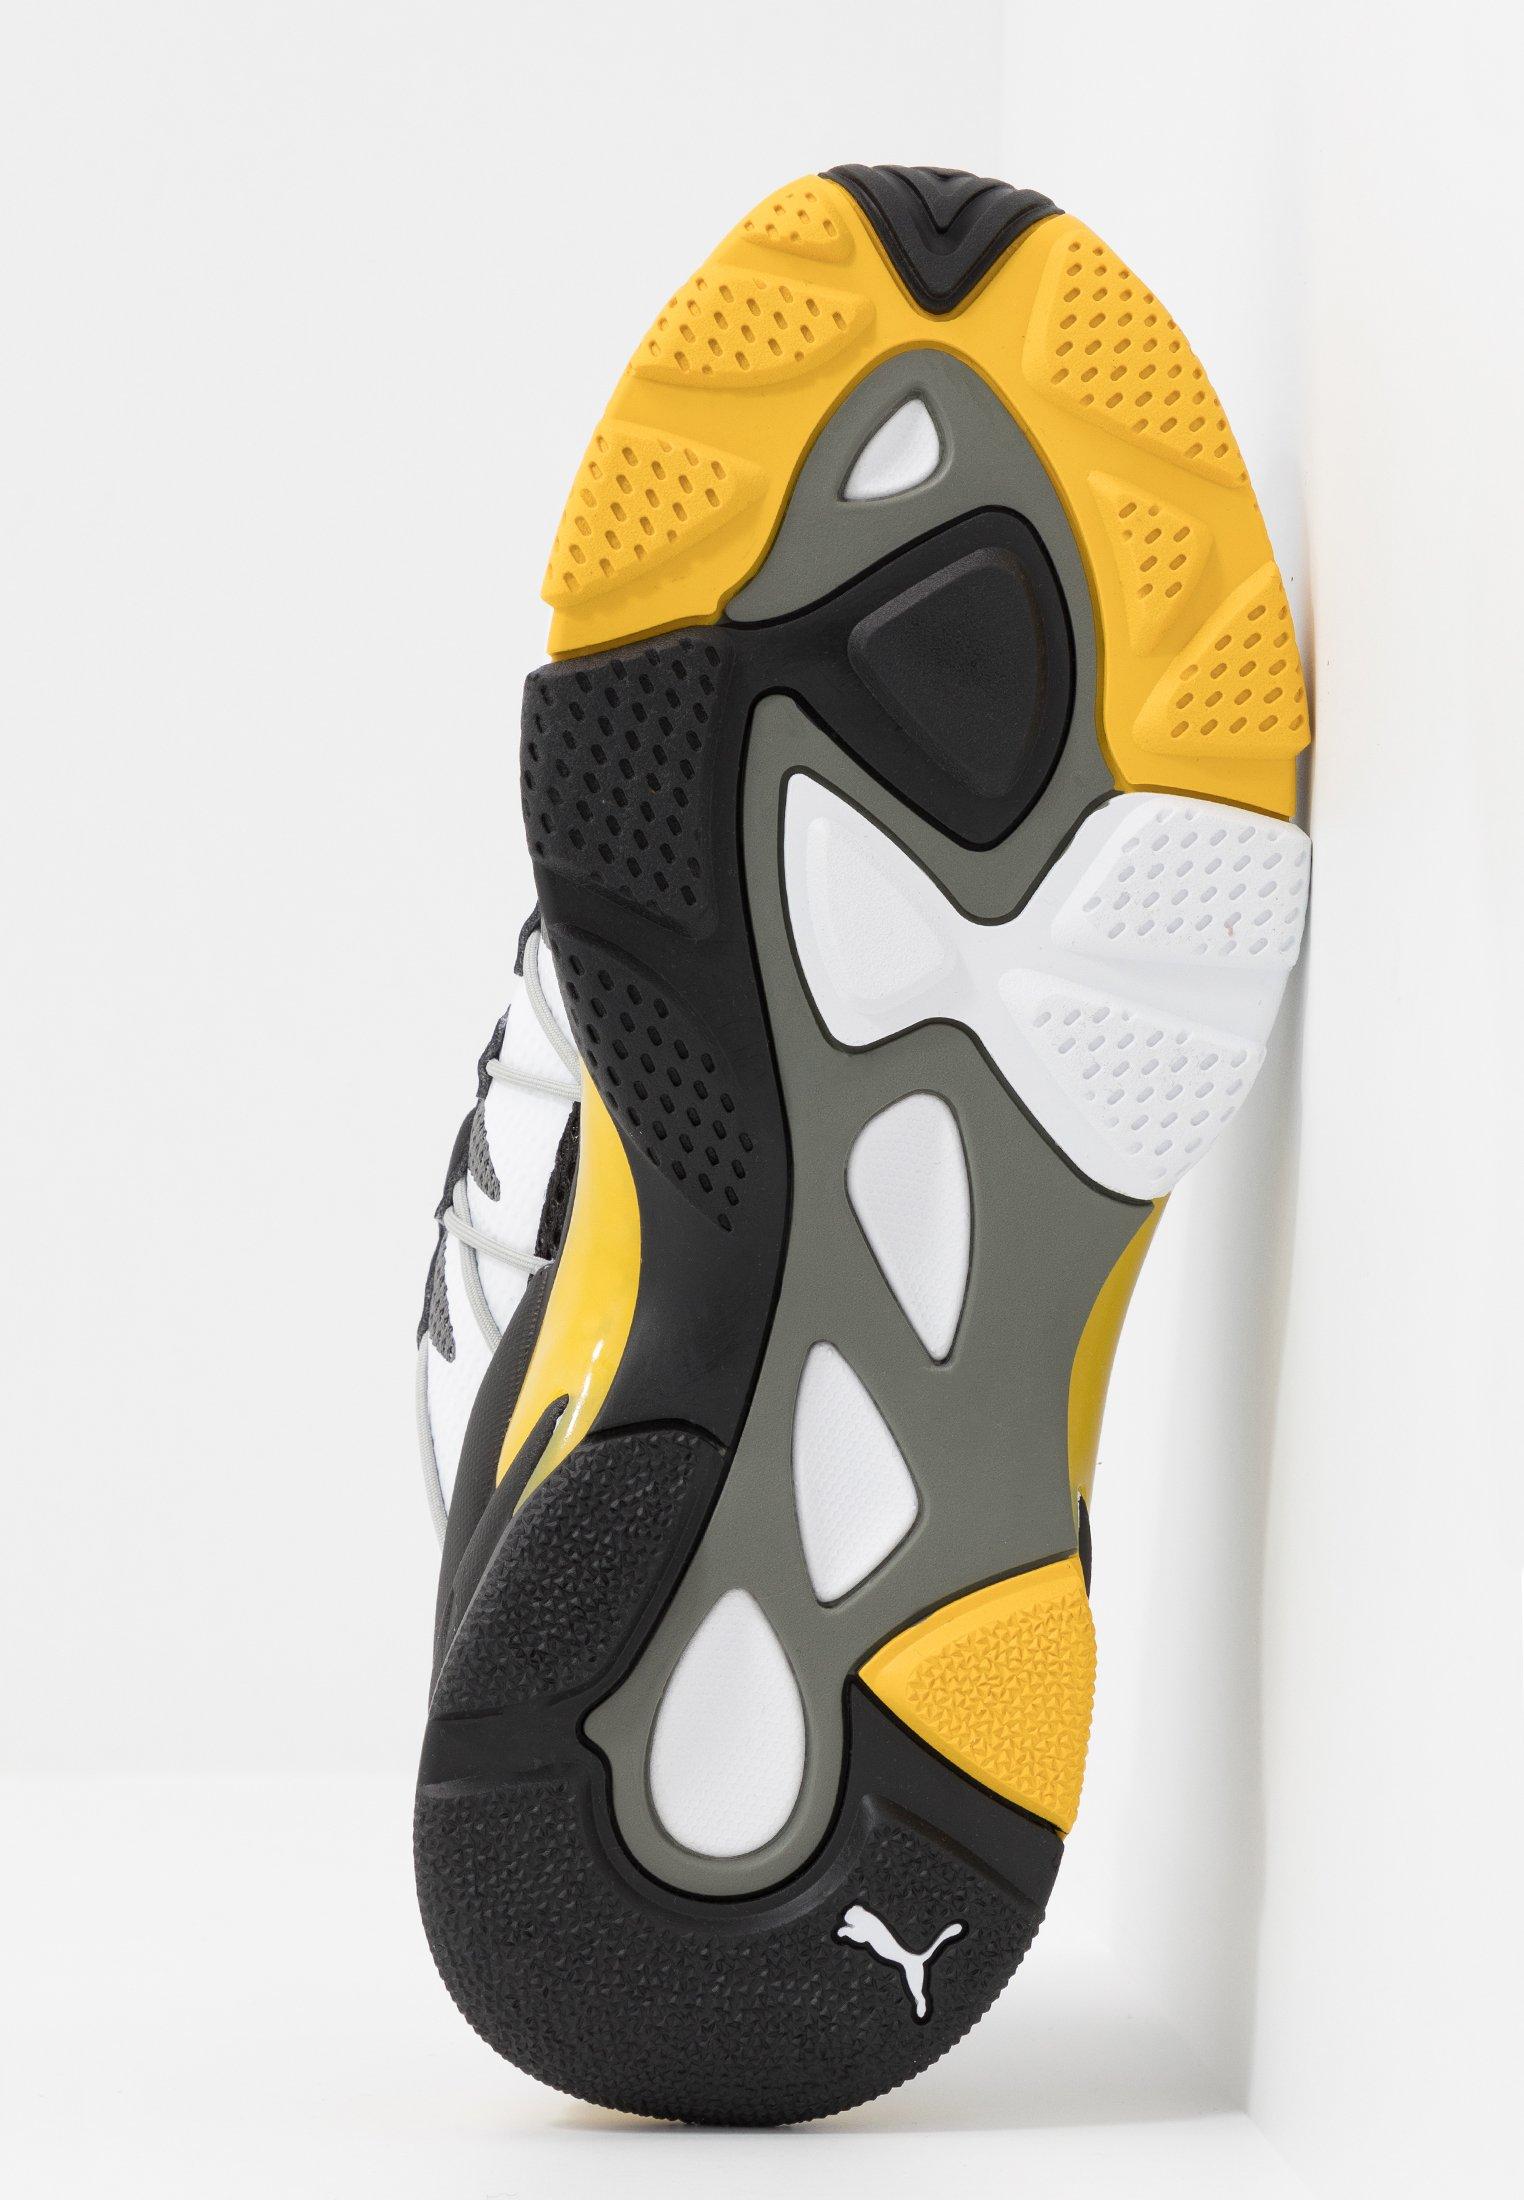 castlerock Lqd Basse Black OmegaSneakers Puma Cell LGqUzMSVp